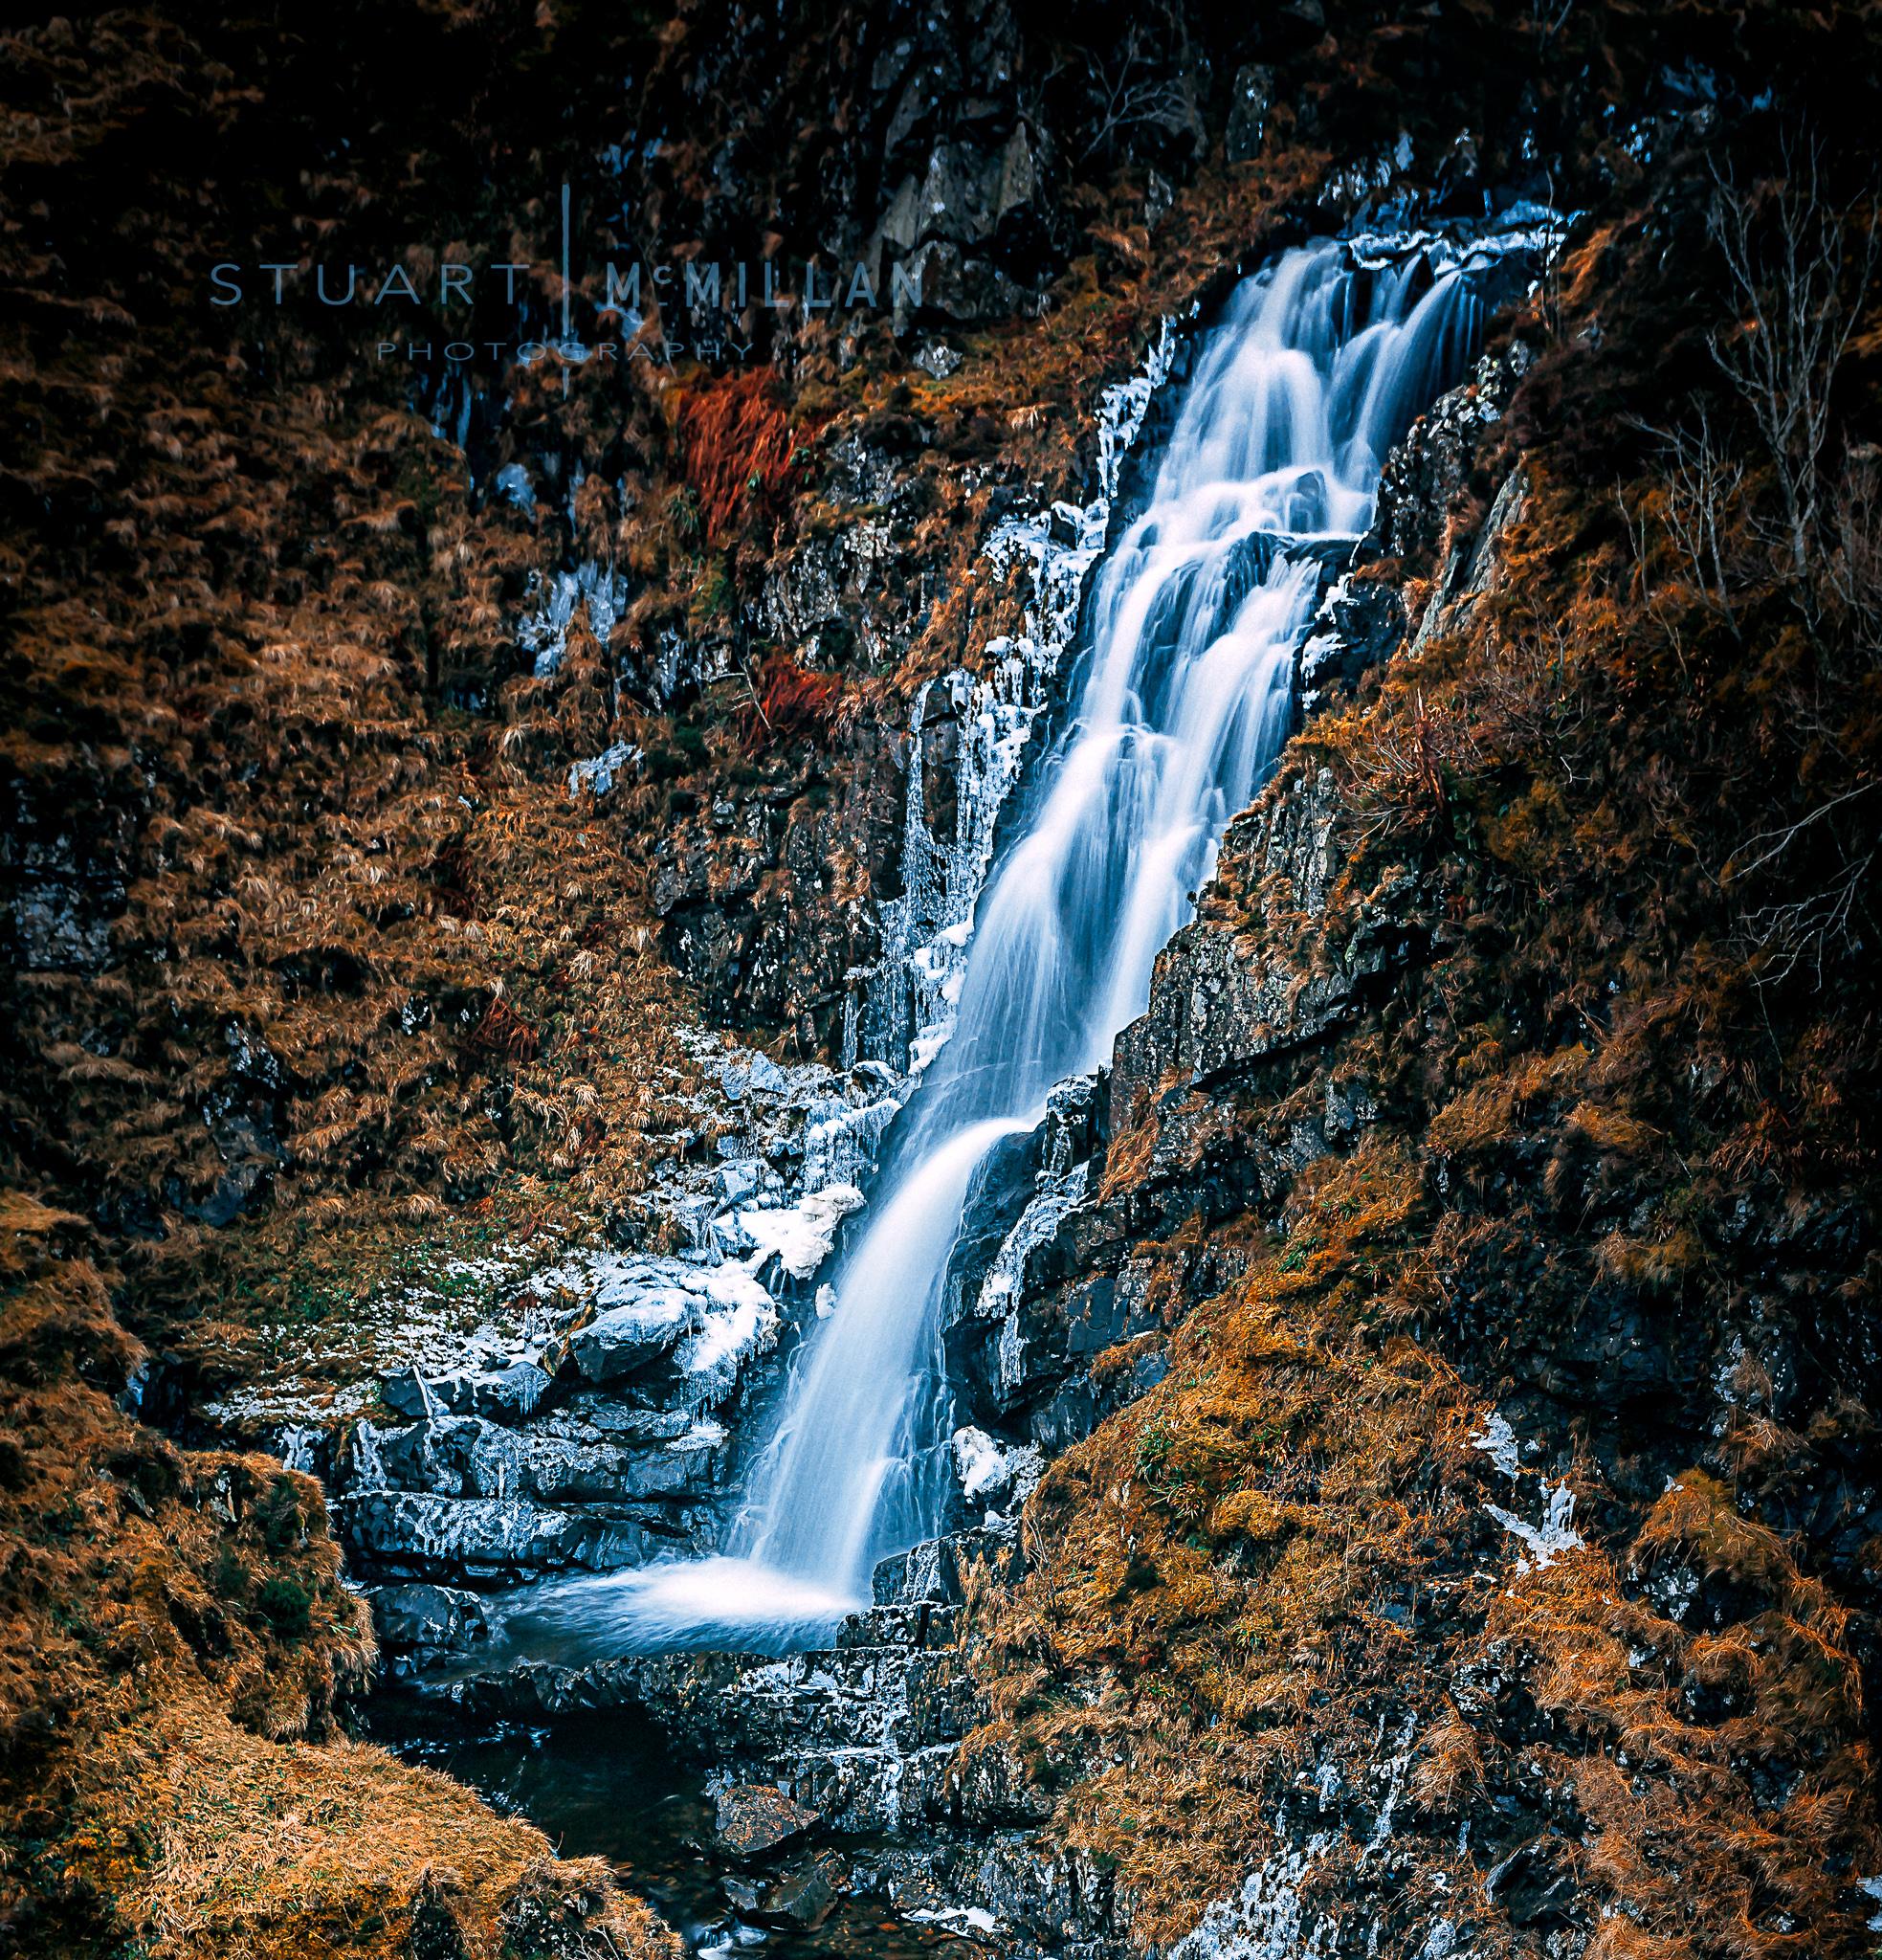 Waterfall below Loch Skeen 5D MKII | EF17-40mm f/4L USM | ISO 50 | f/6.3